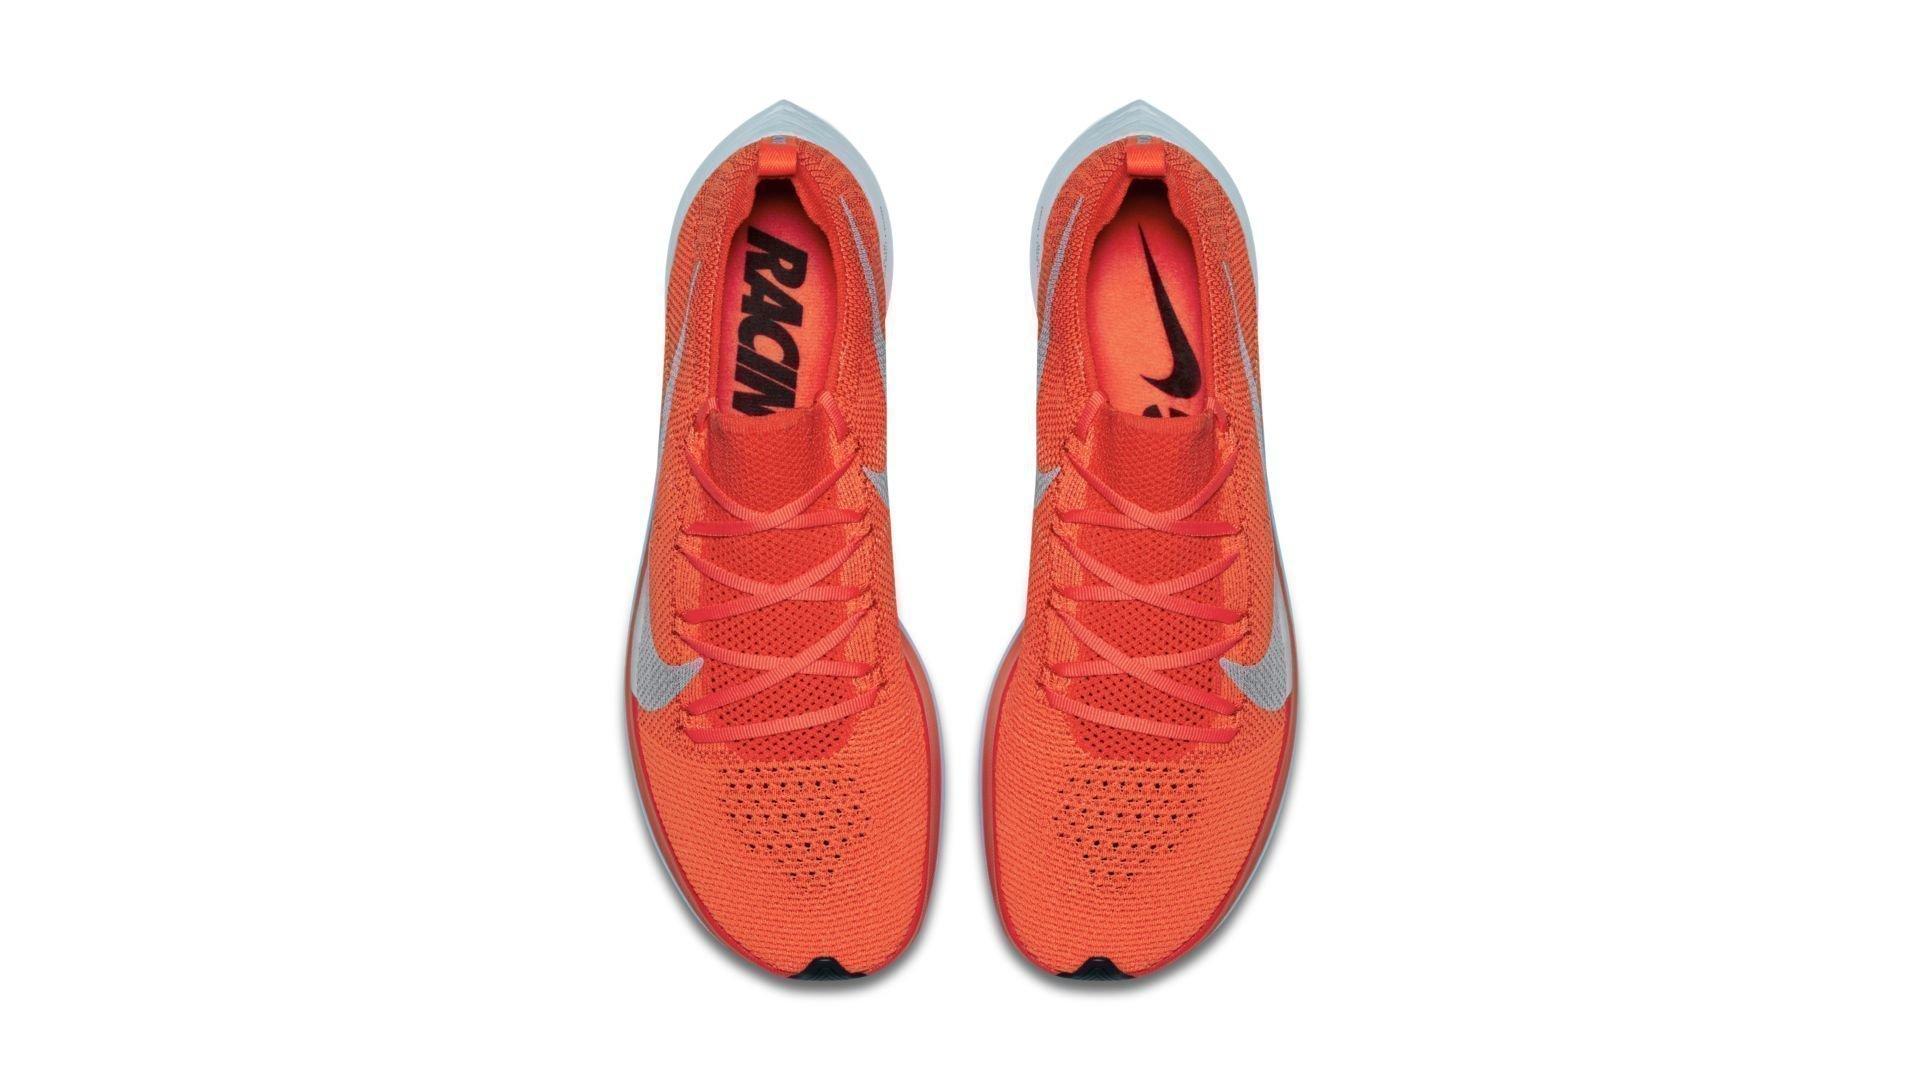 Nike Zoom VaporFly 4% Flyknit Bright Crimson (AJ3857-600)